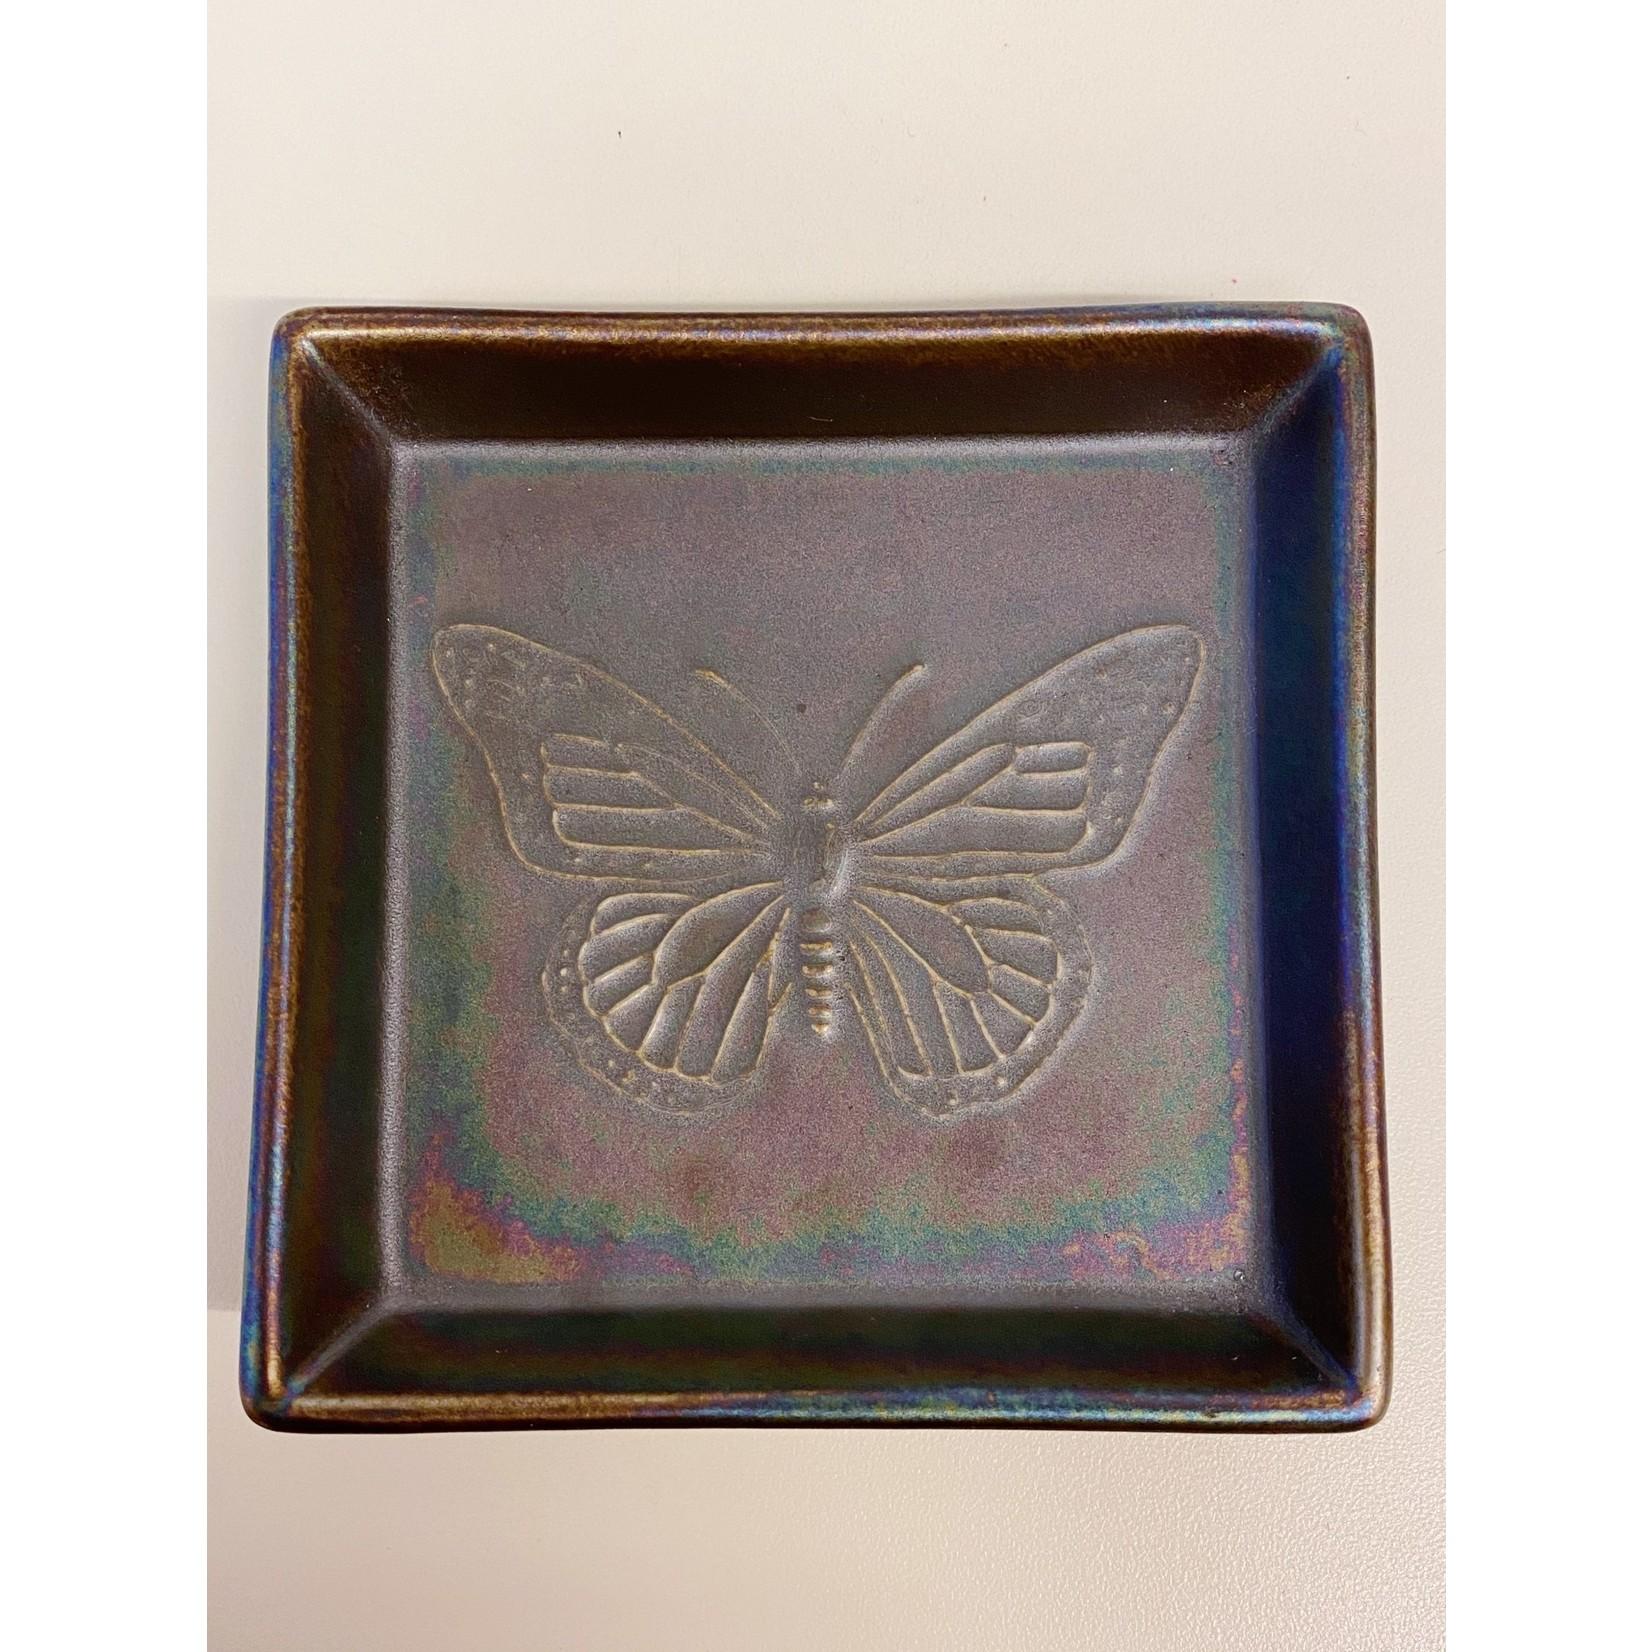 Kotobuki Trading Co. Inc Plate Sq Rainbow Lstr Butterfly